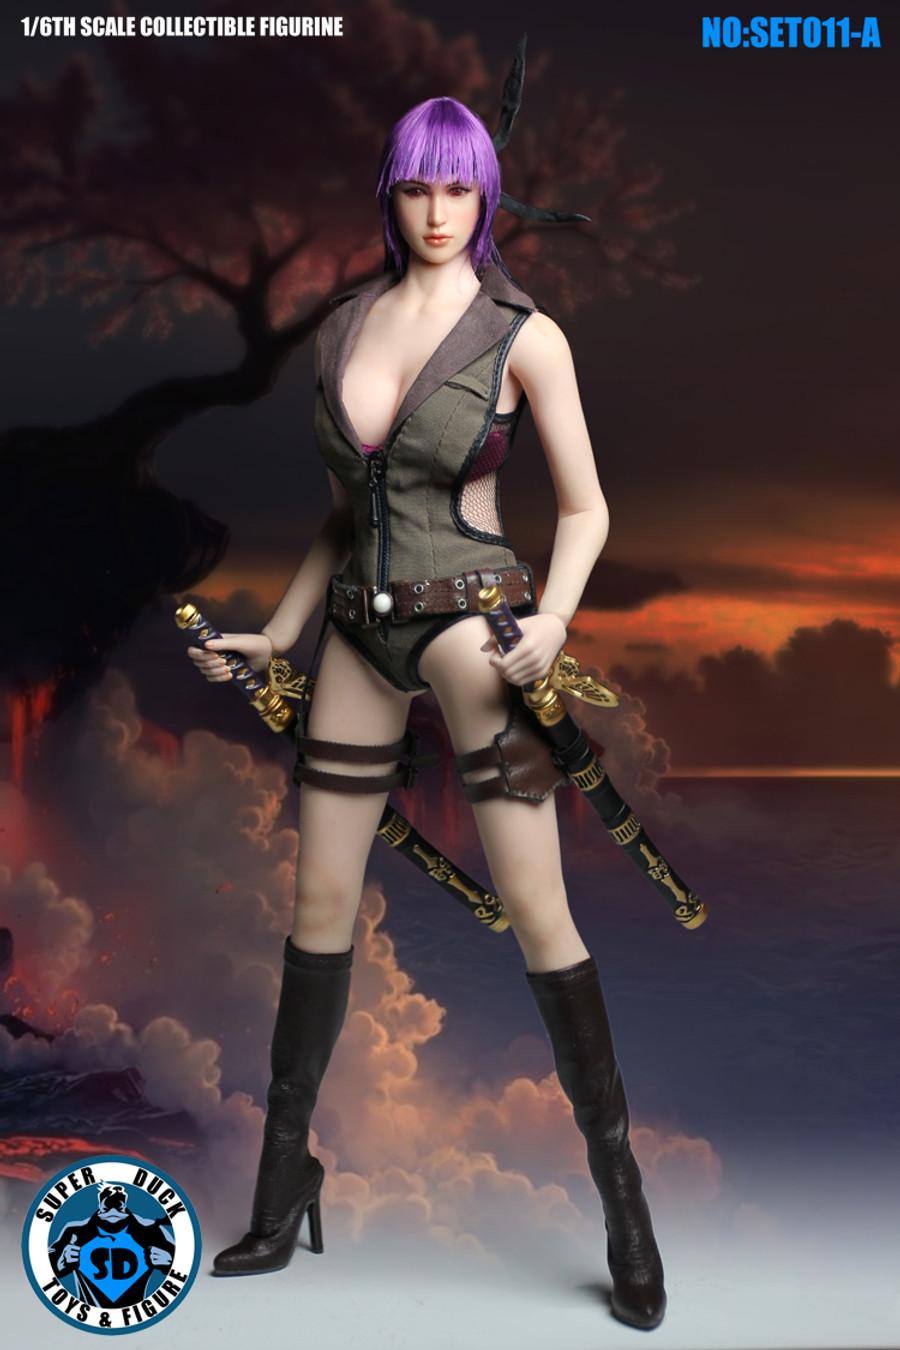 Super Duck - Cosplay Series - Fighting Girls Set